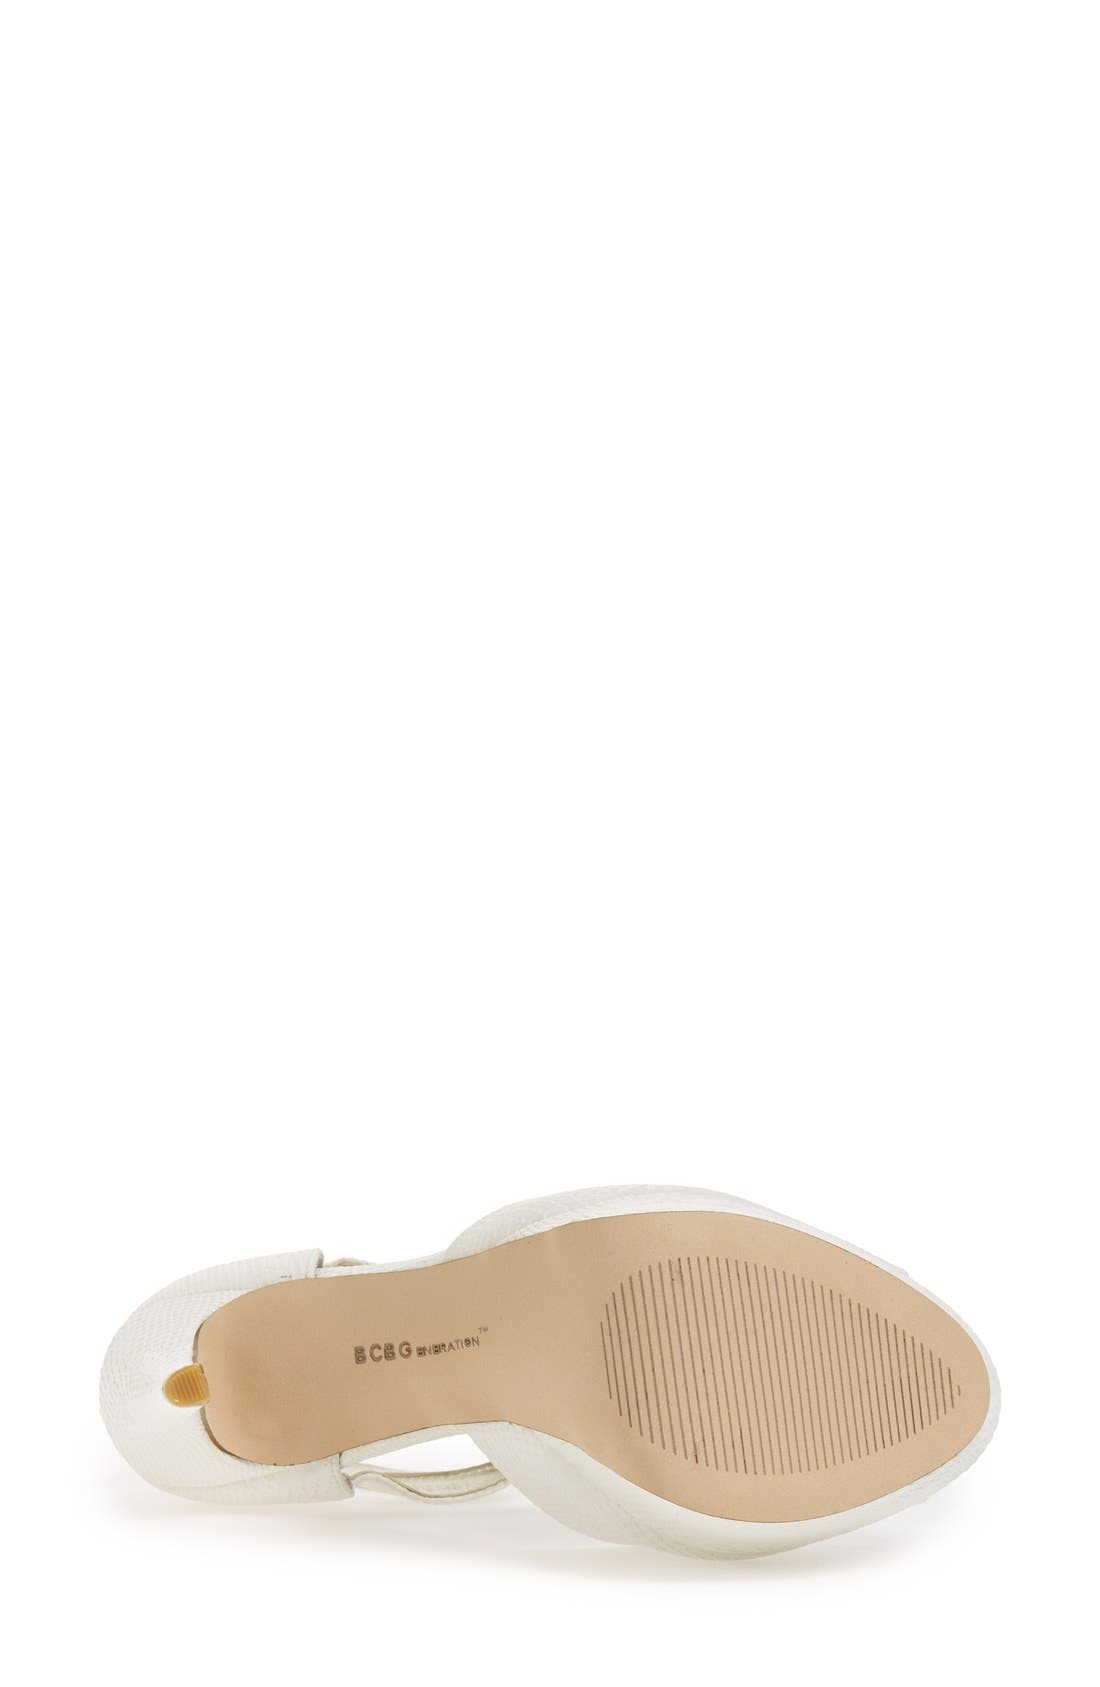 Alternate Image 3  - BCBGeneration 'Vix' Platform Sandal (Women)